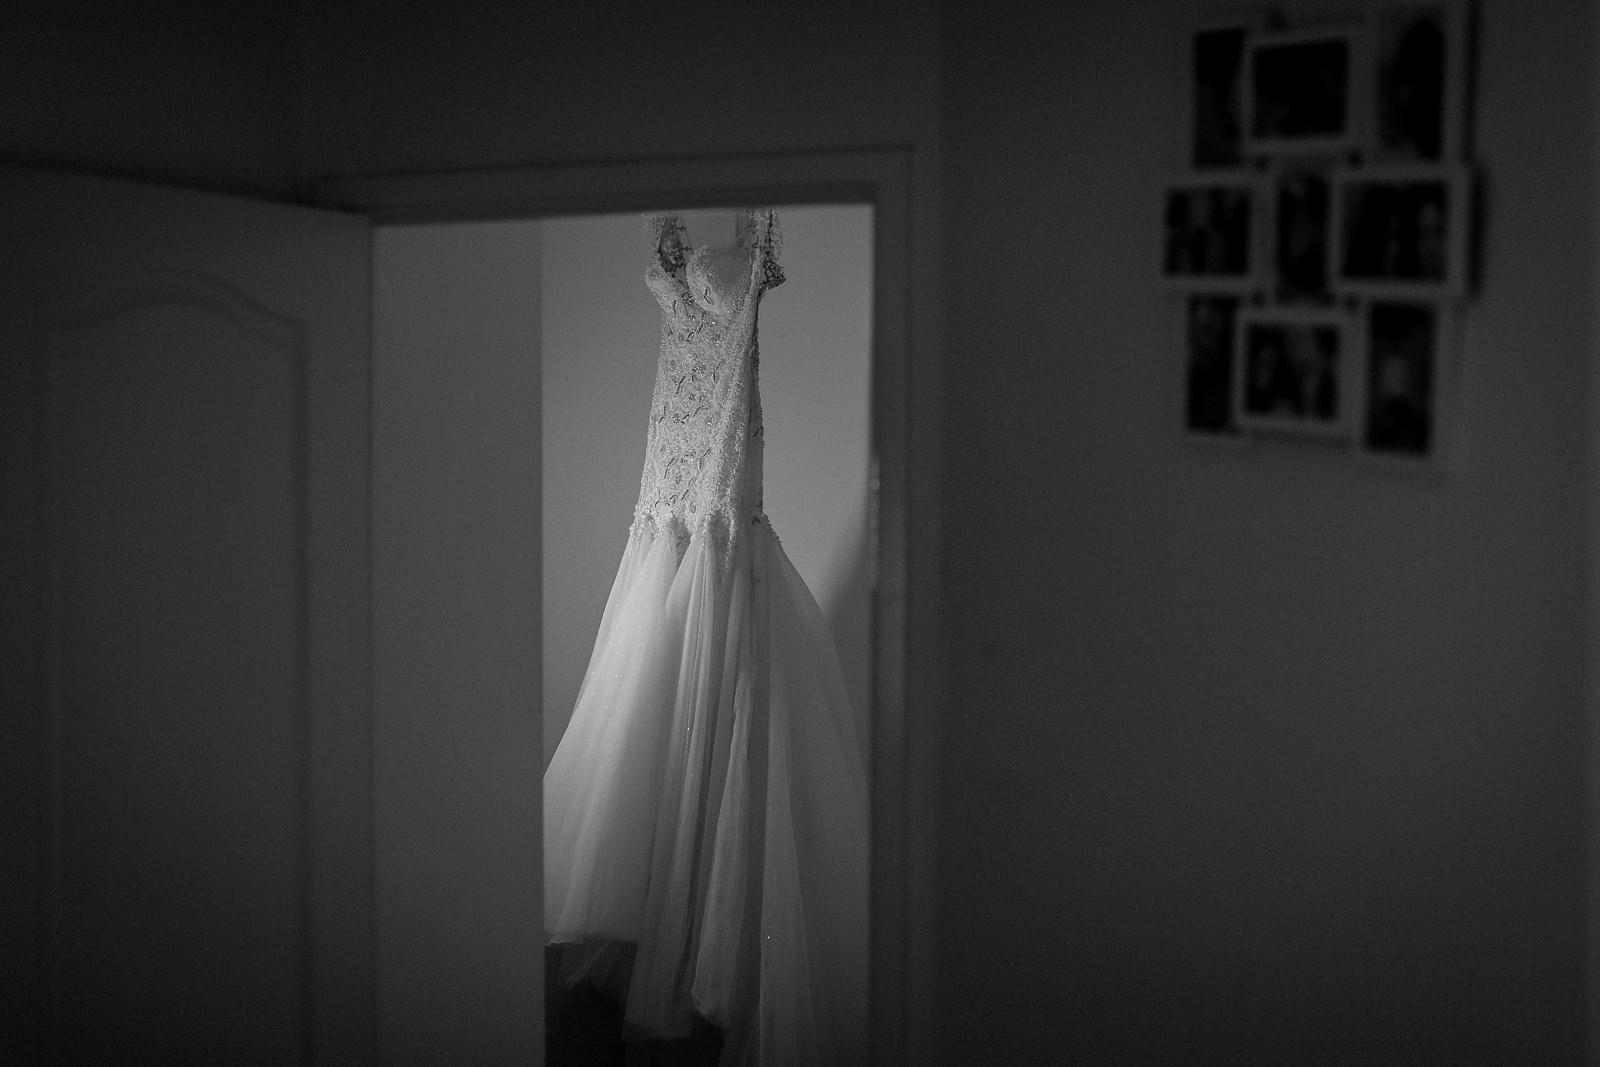 Galia lahav haute couture Giselle dress